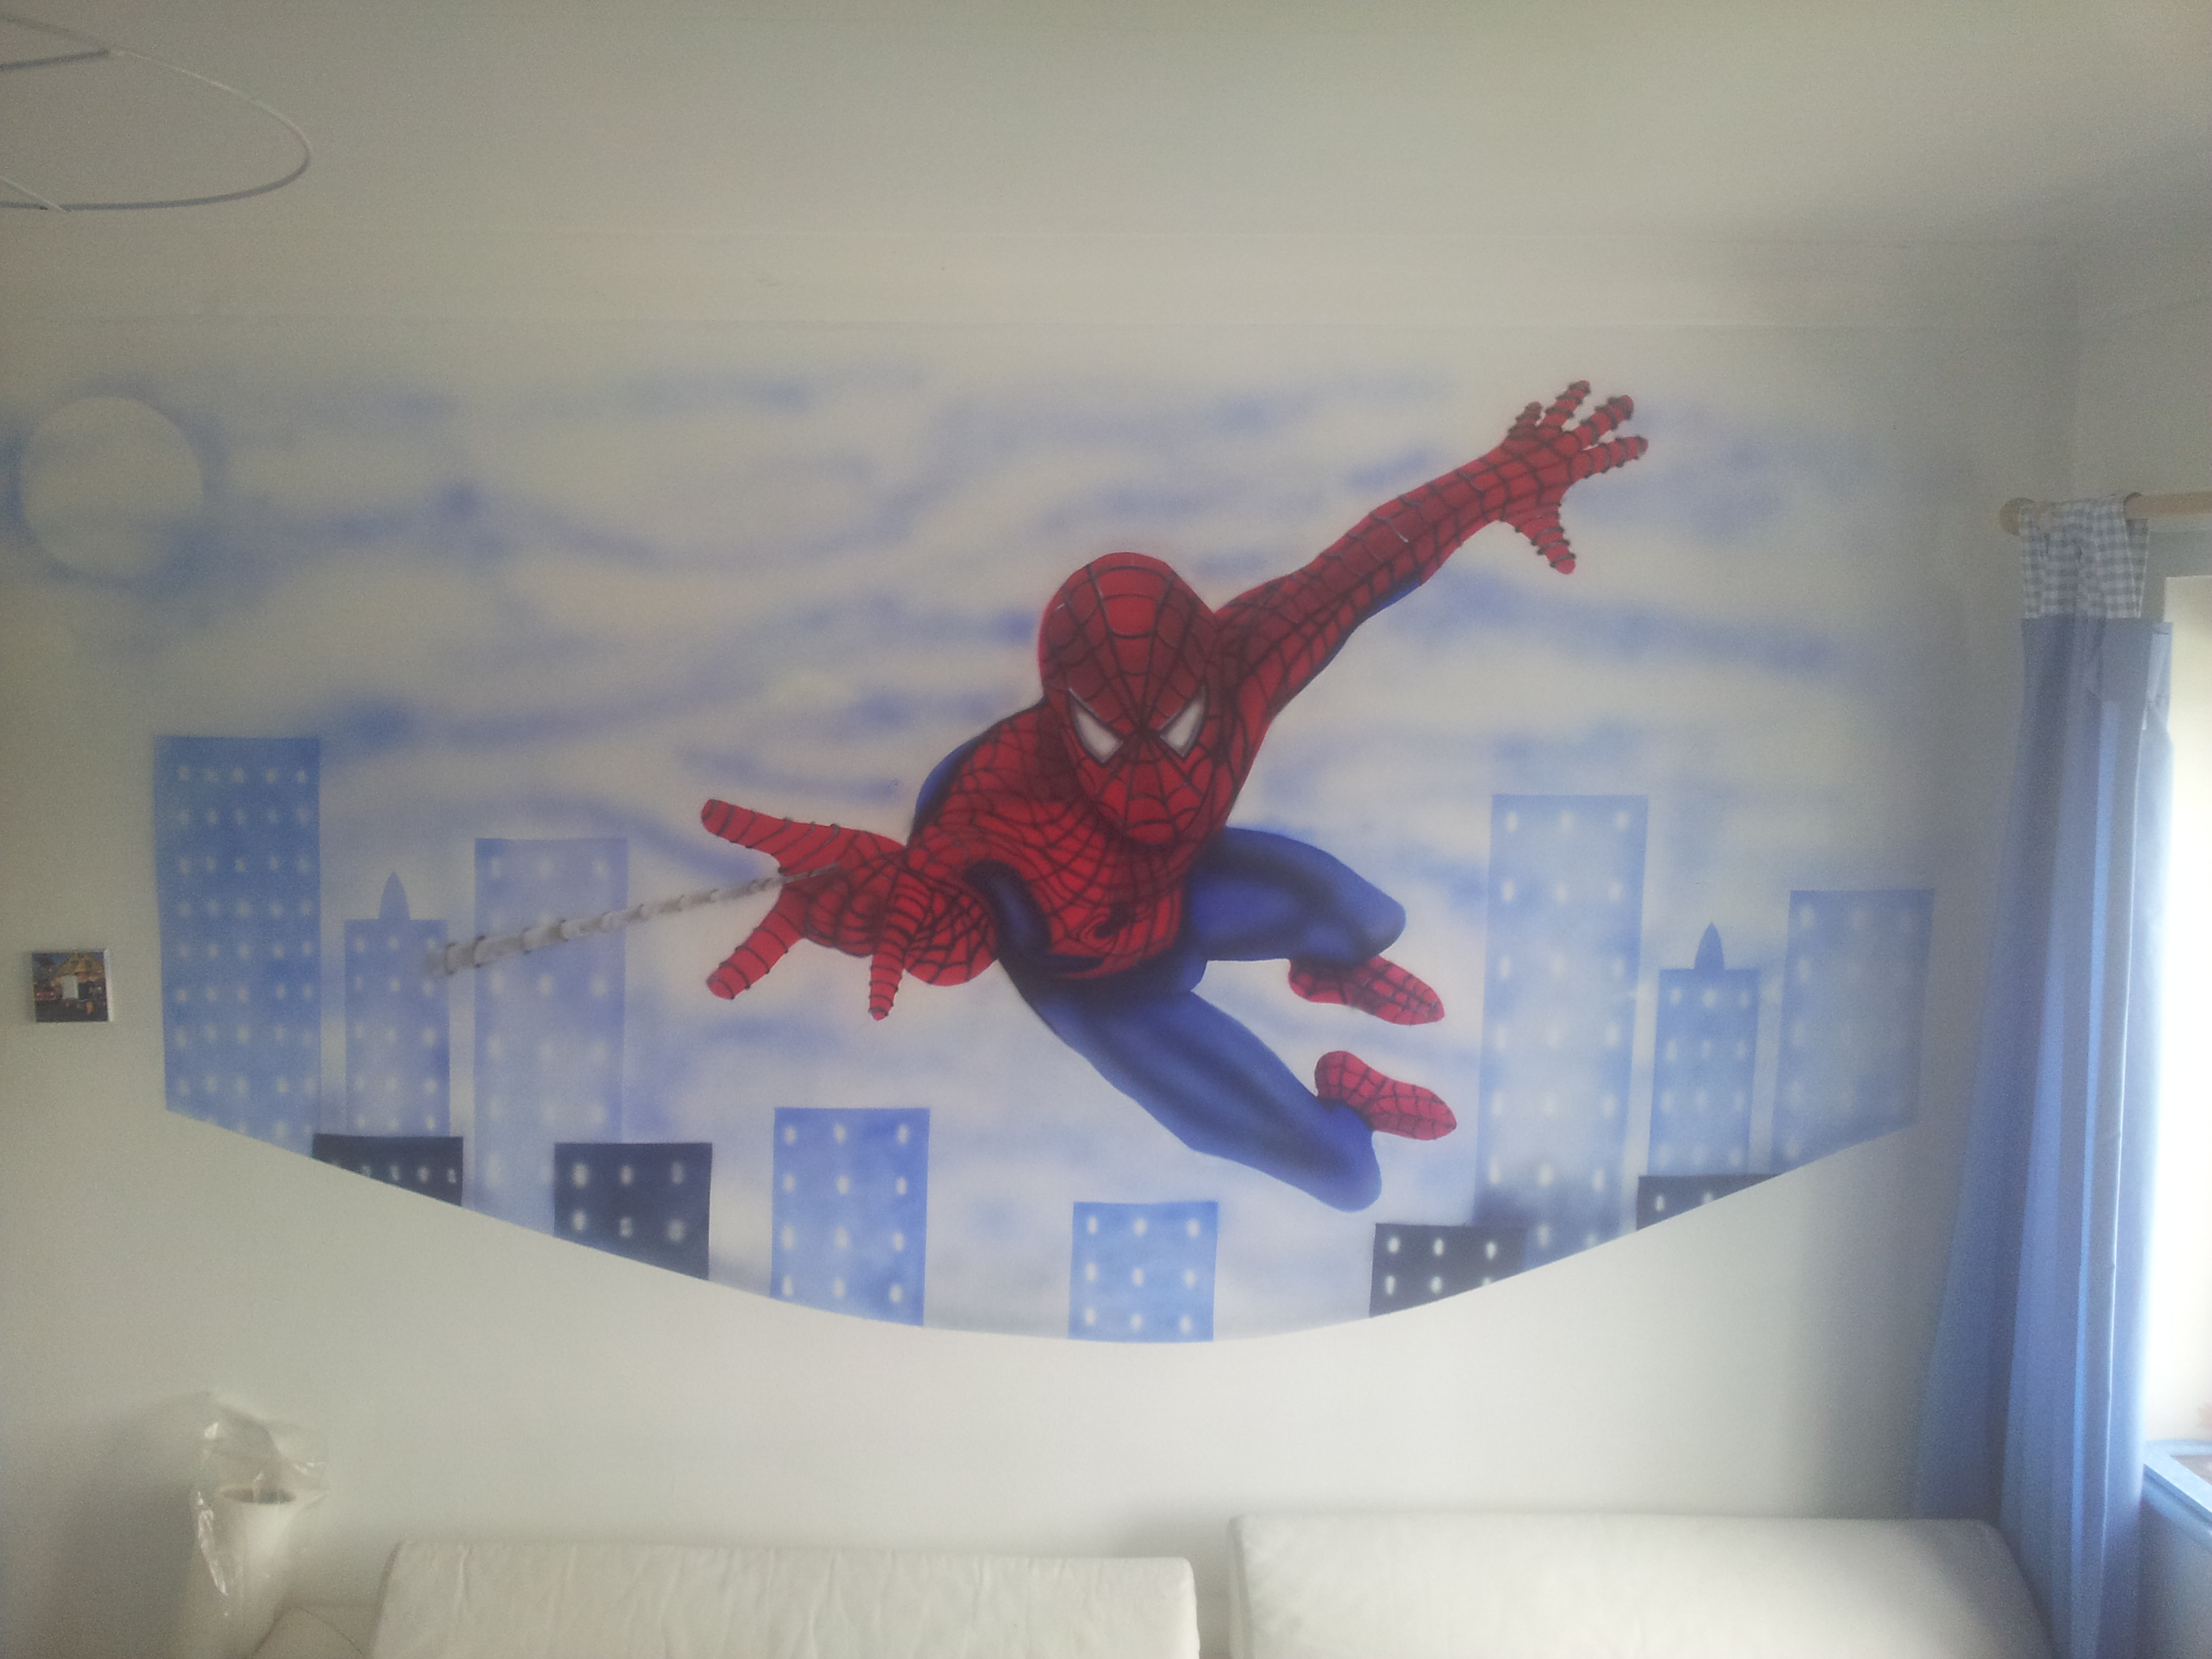 Airbrushingmurals spiderman wall mural amipublicfo Choice Image